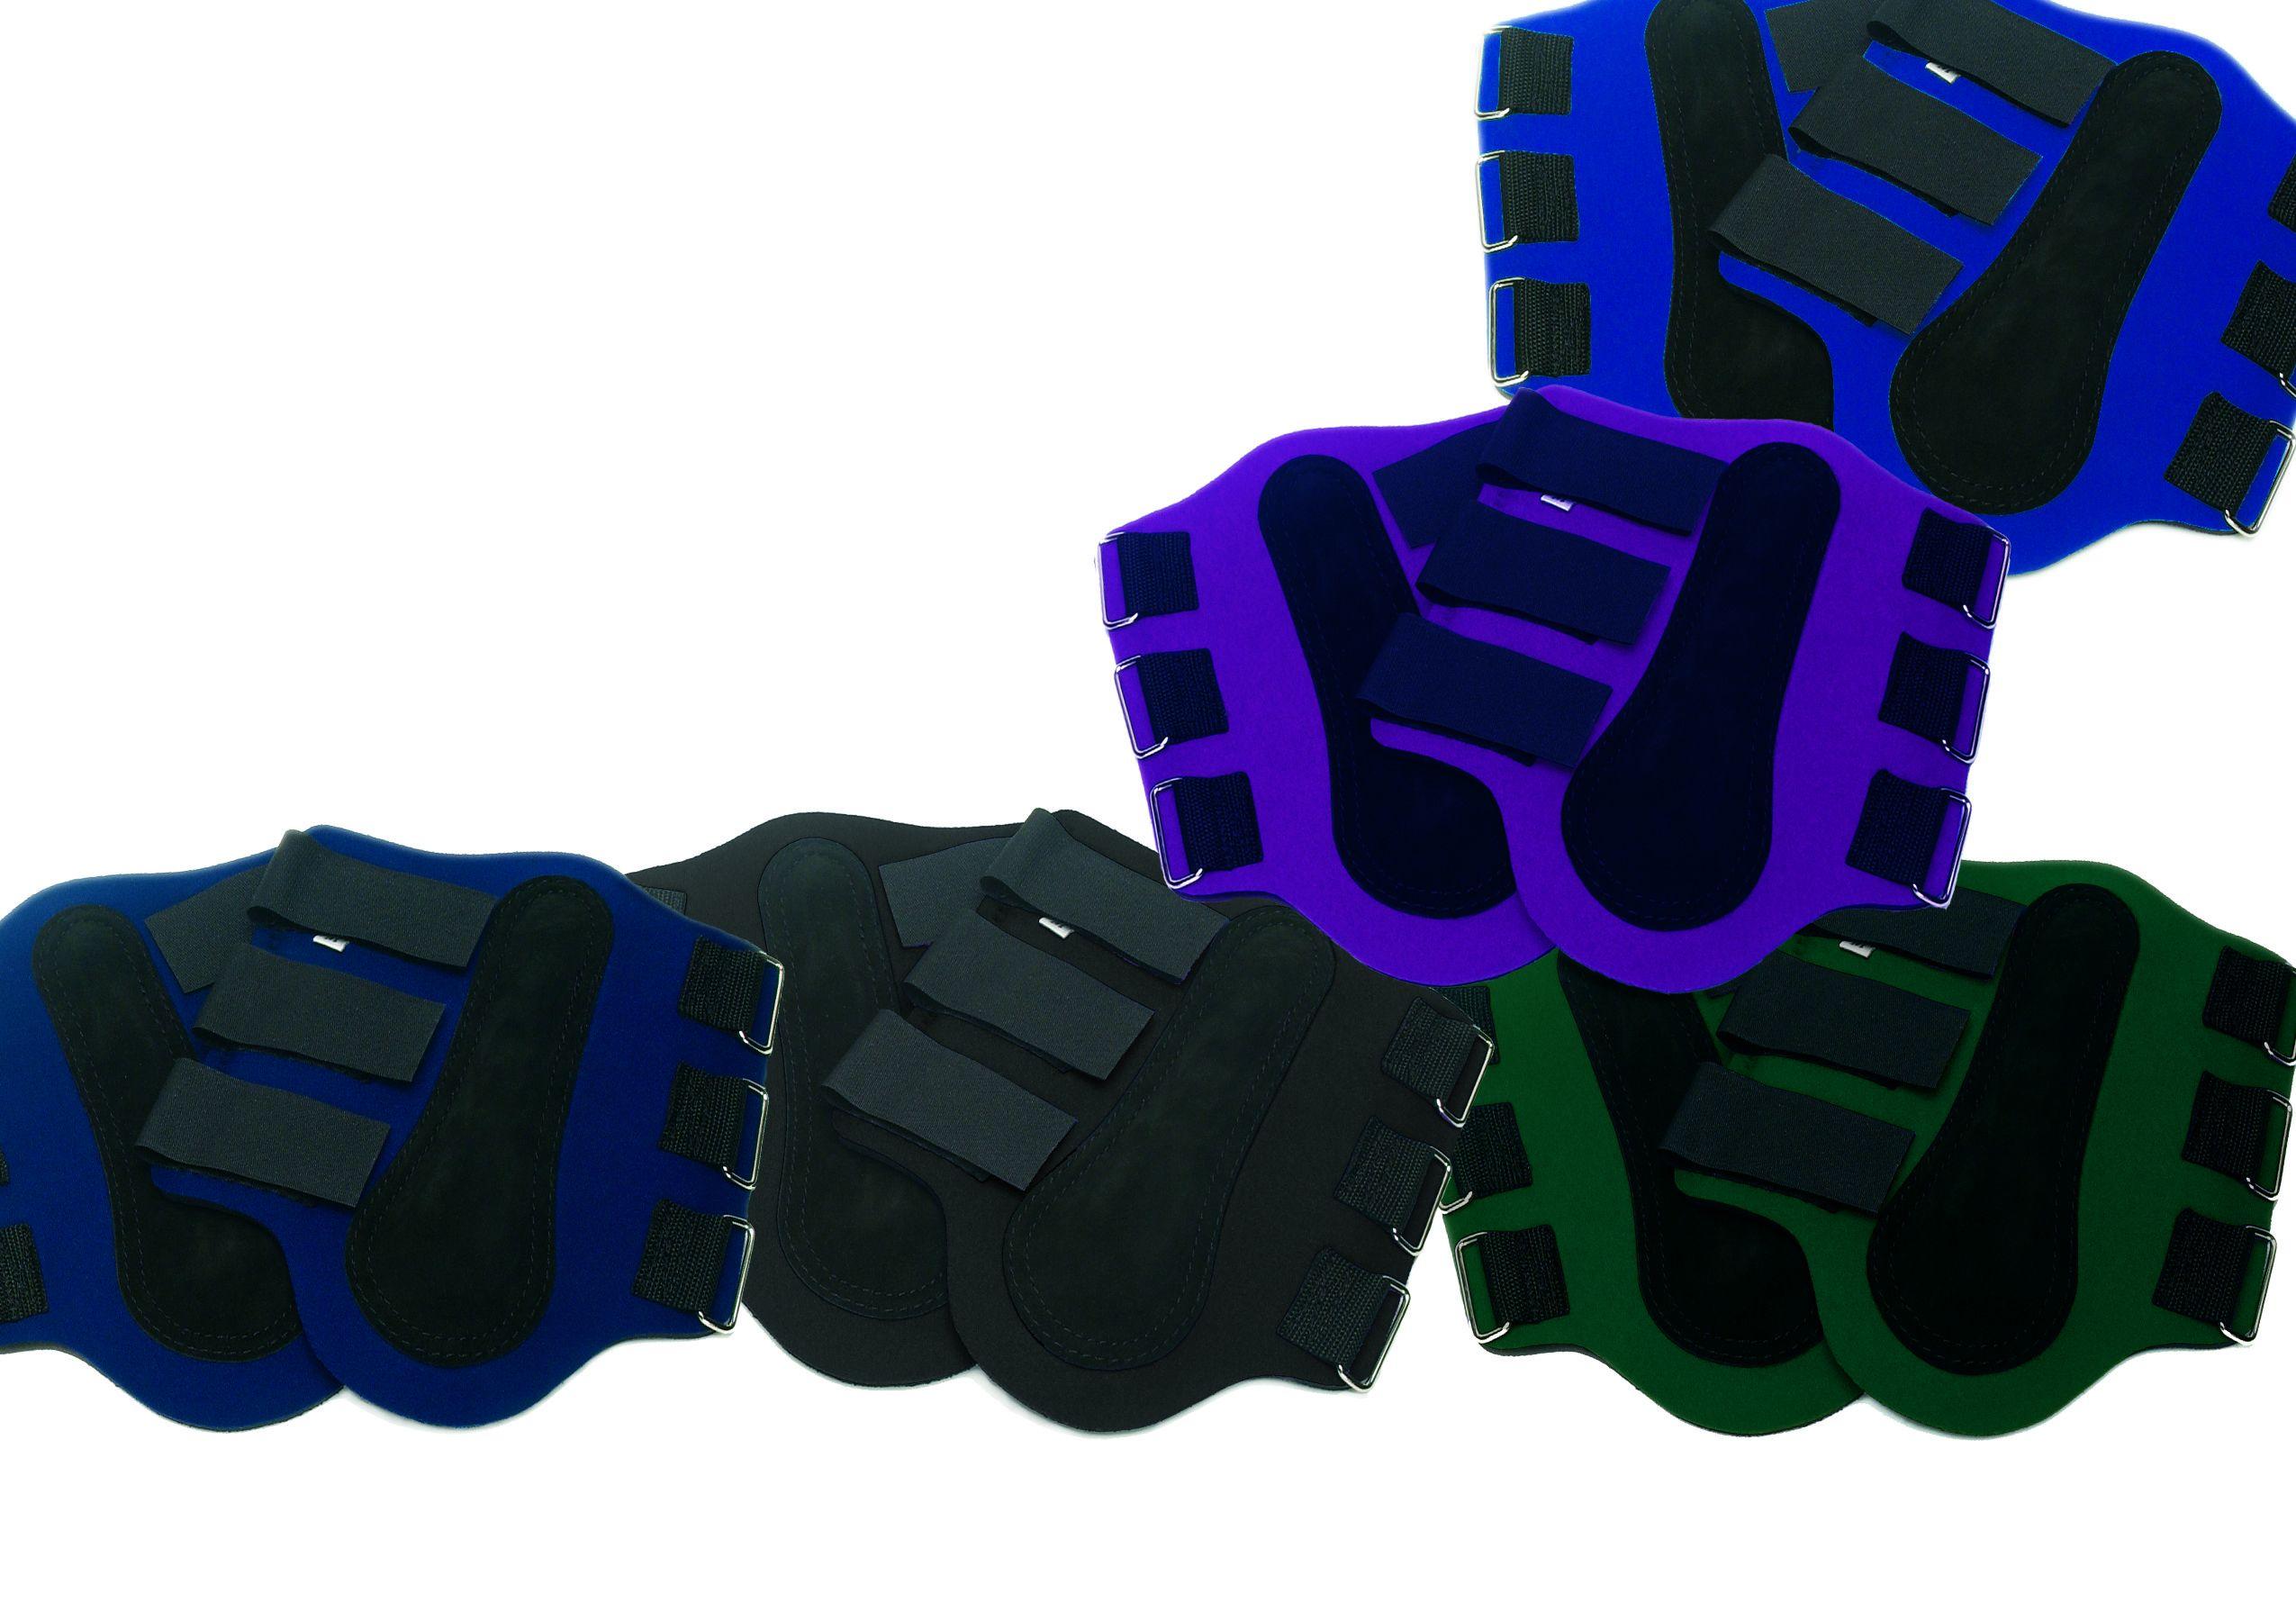 Centaur Equi-Star Neoprene Splint Boots